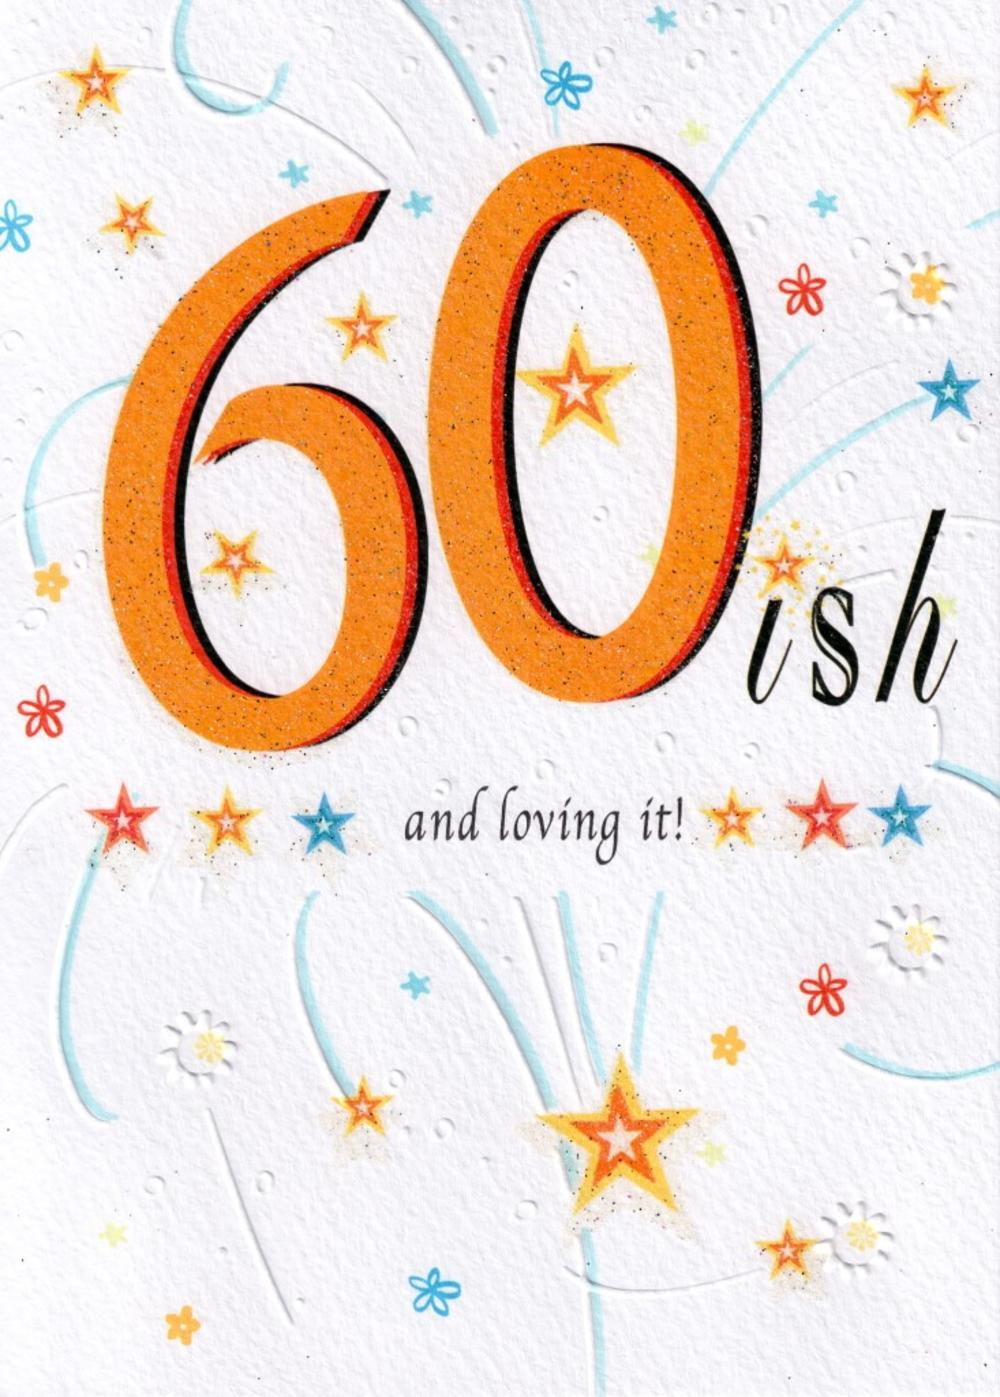 60 ish loving it happy 60th birthday card cards love kates 60 ish loving it happy 60th birthday card bookmarktalkfo Gallery